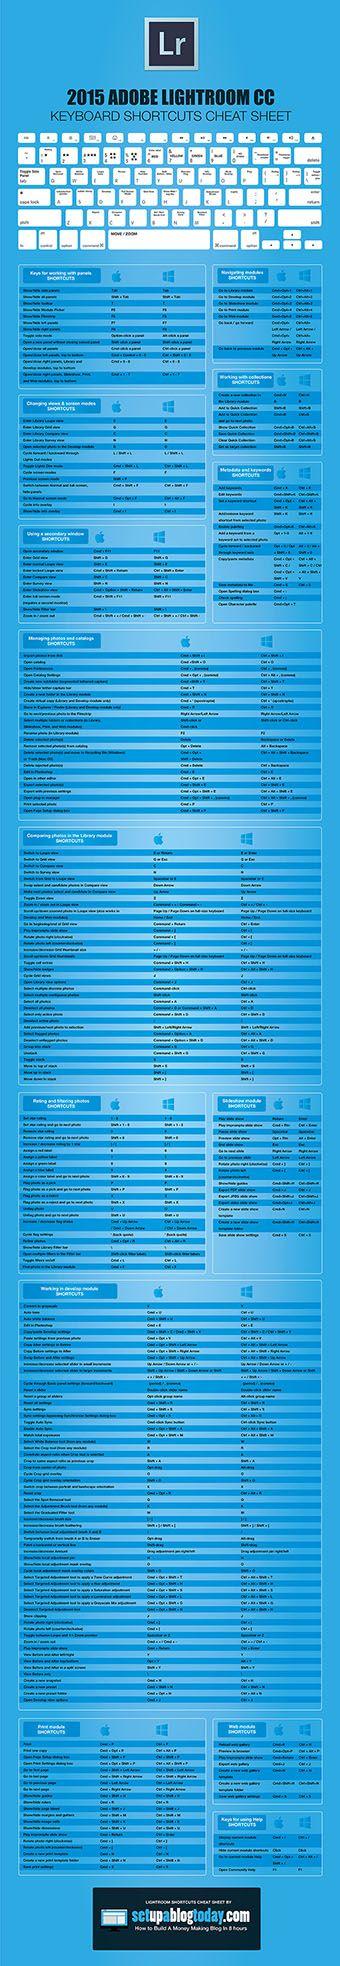 Petapixel - Ultimate Cheat Sheet for Lightroom CC(2015)